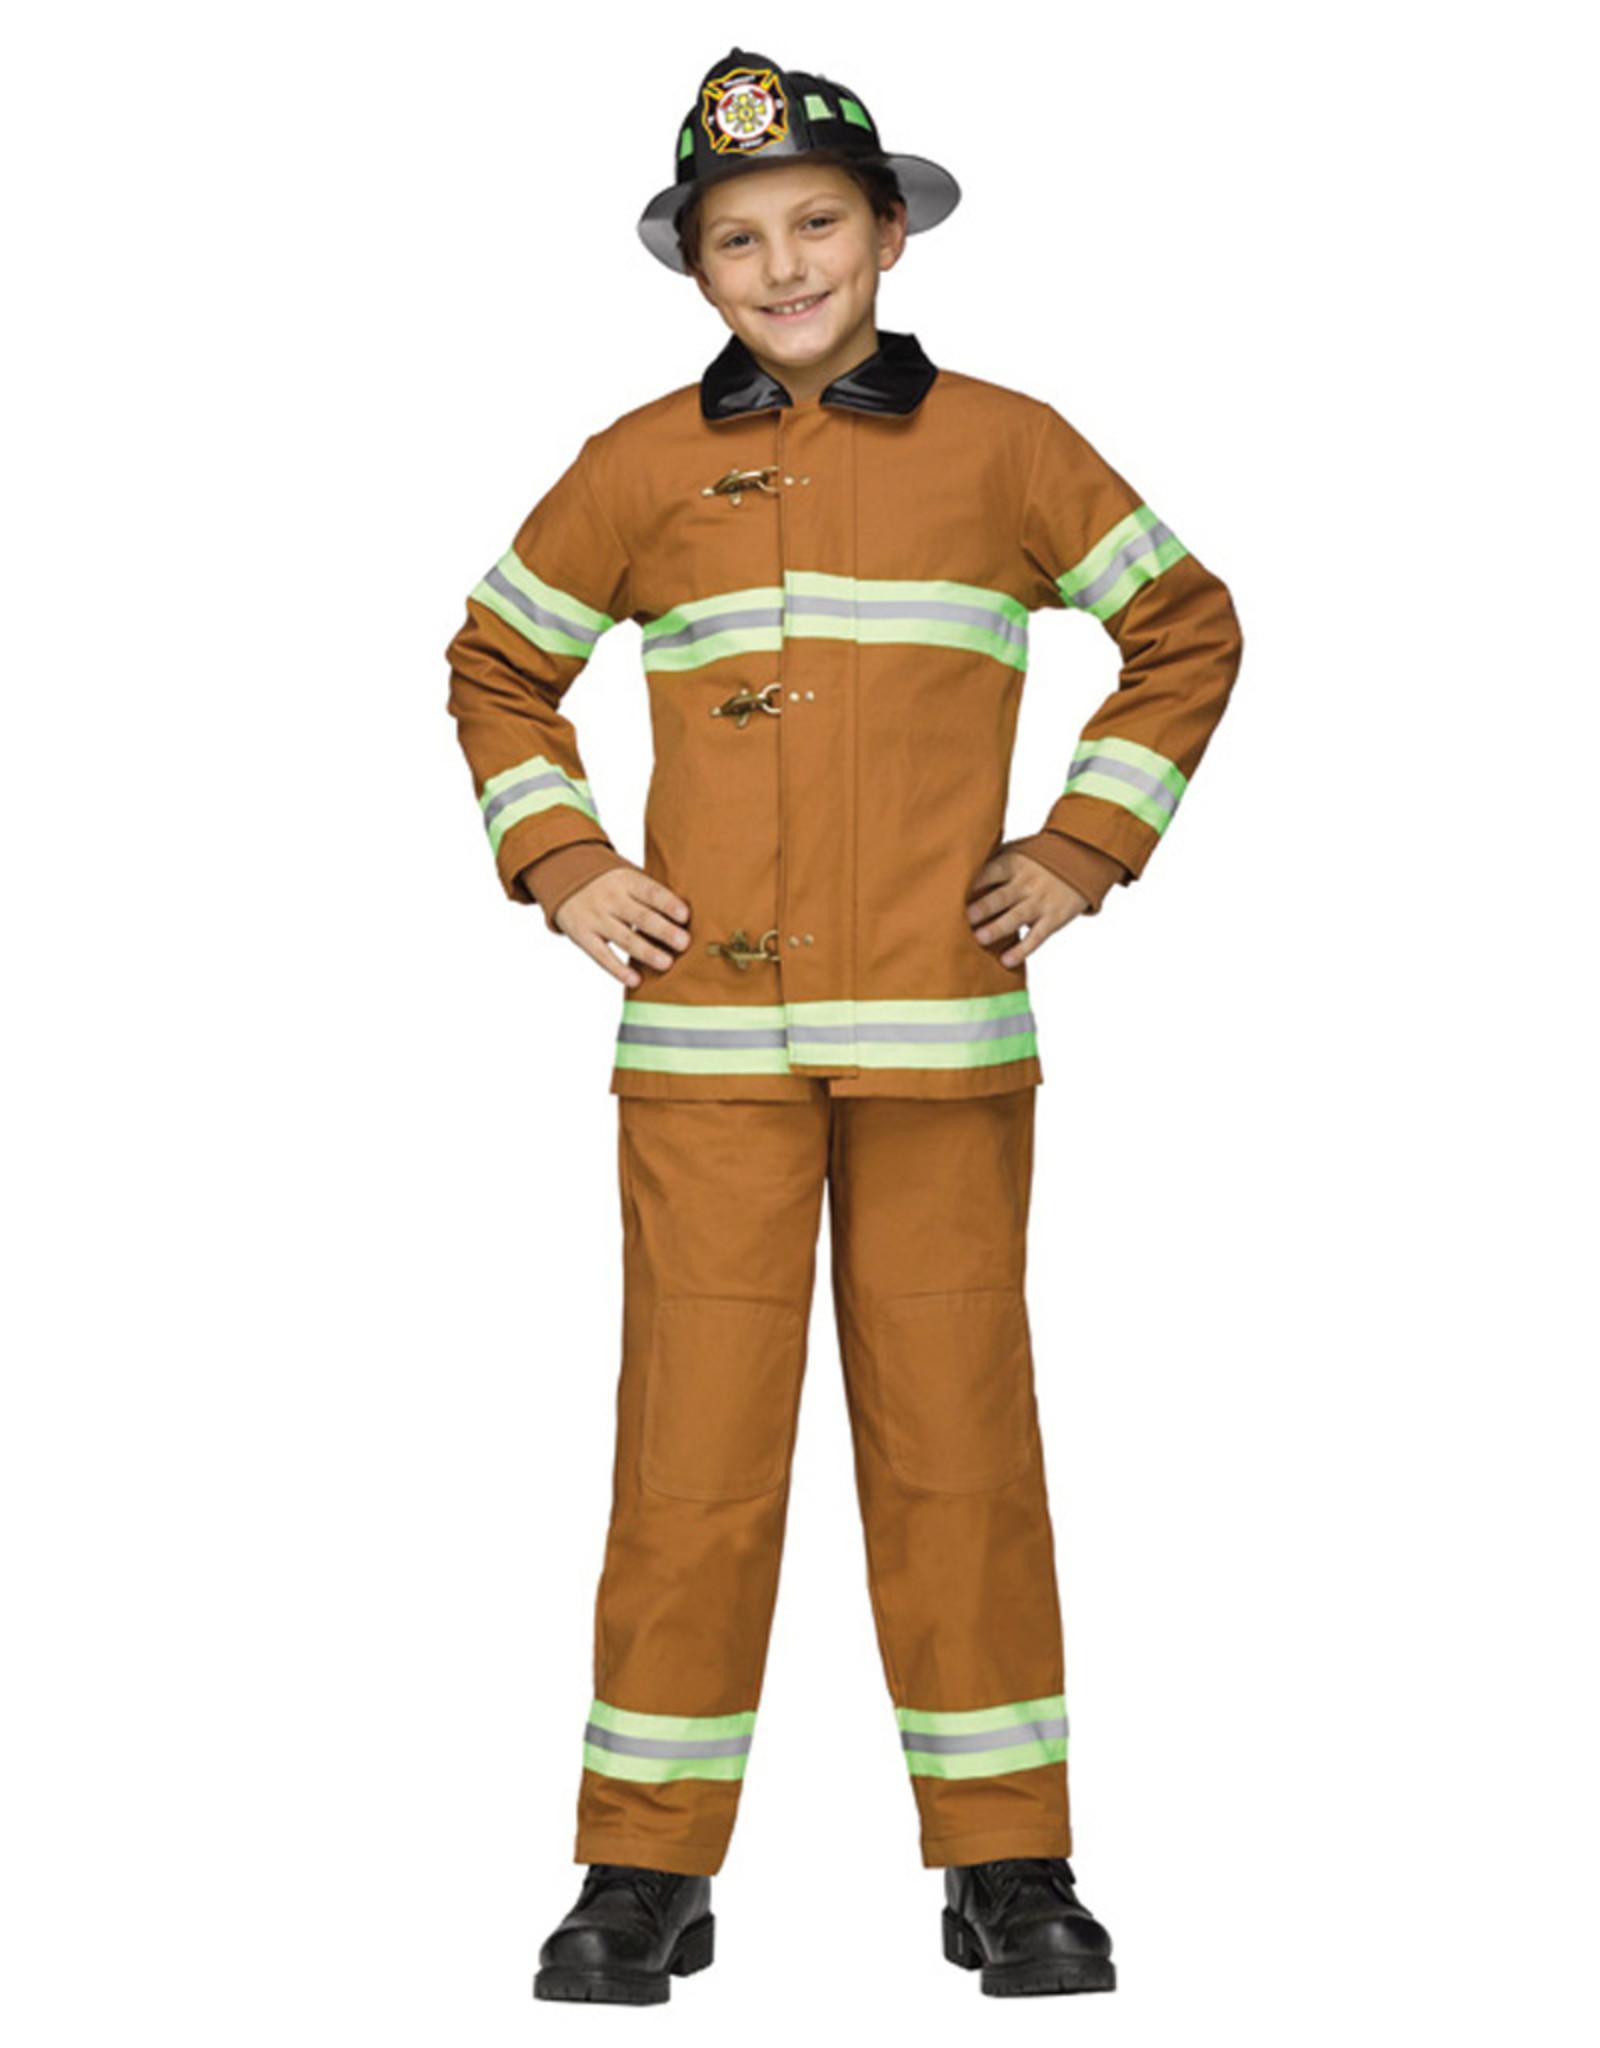 Fireman Deluxe Costume - Boys